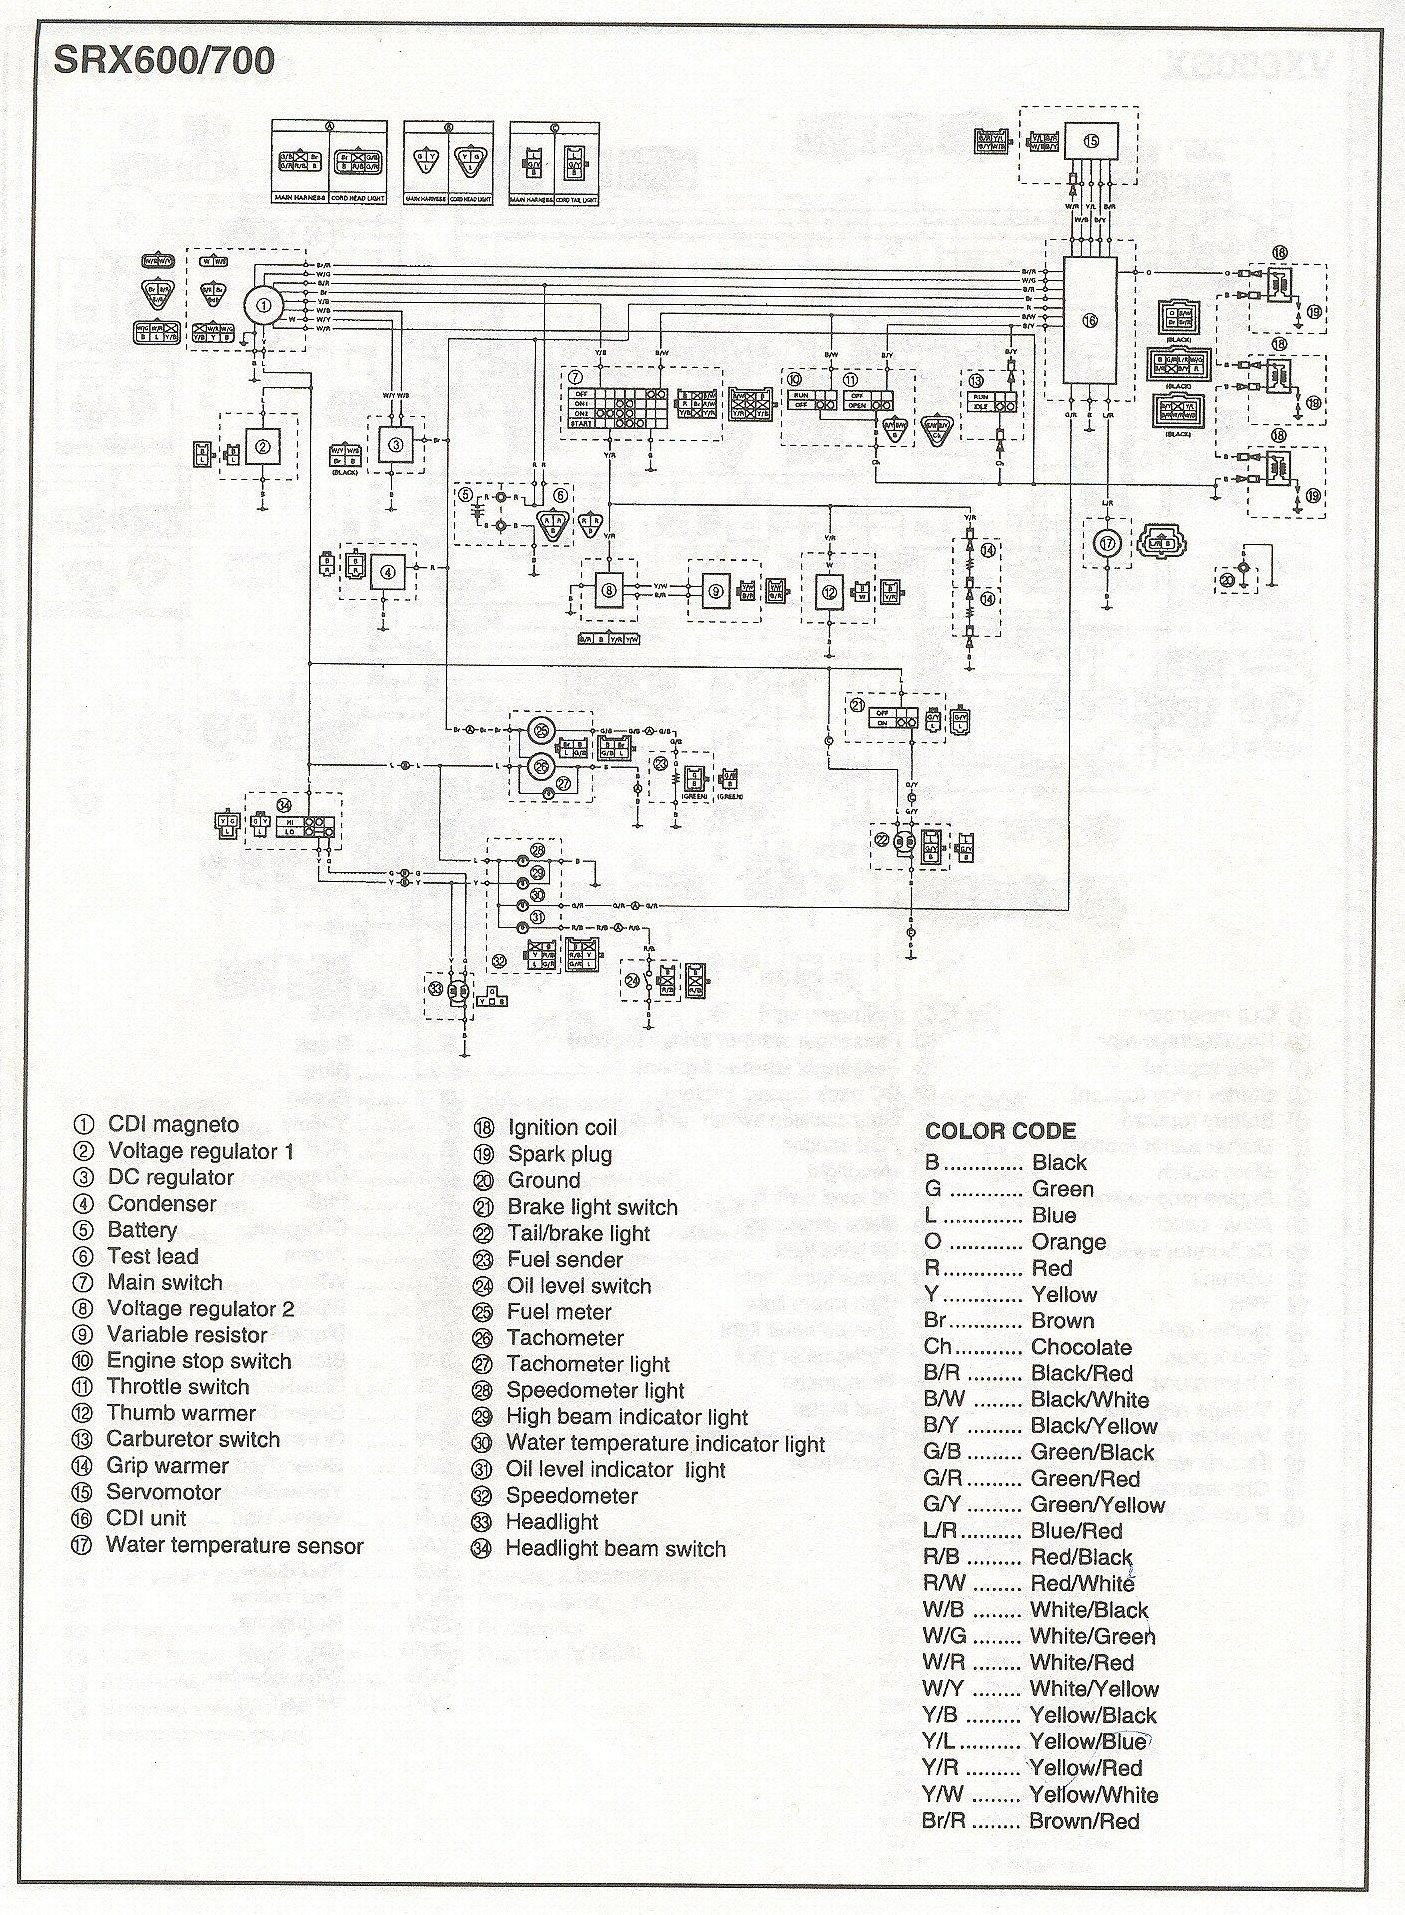 2009 yamaha raptor 700 wiring diagram trailer plug great installation of 2001 srx easy diagrams rh 89 superpole exhausts de sx